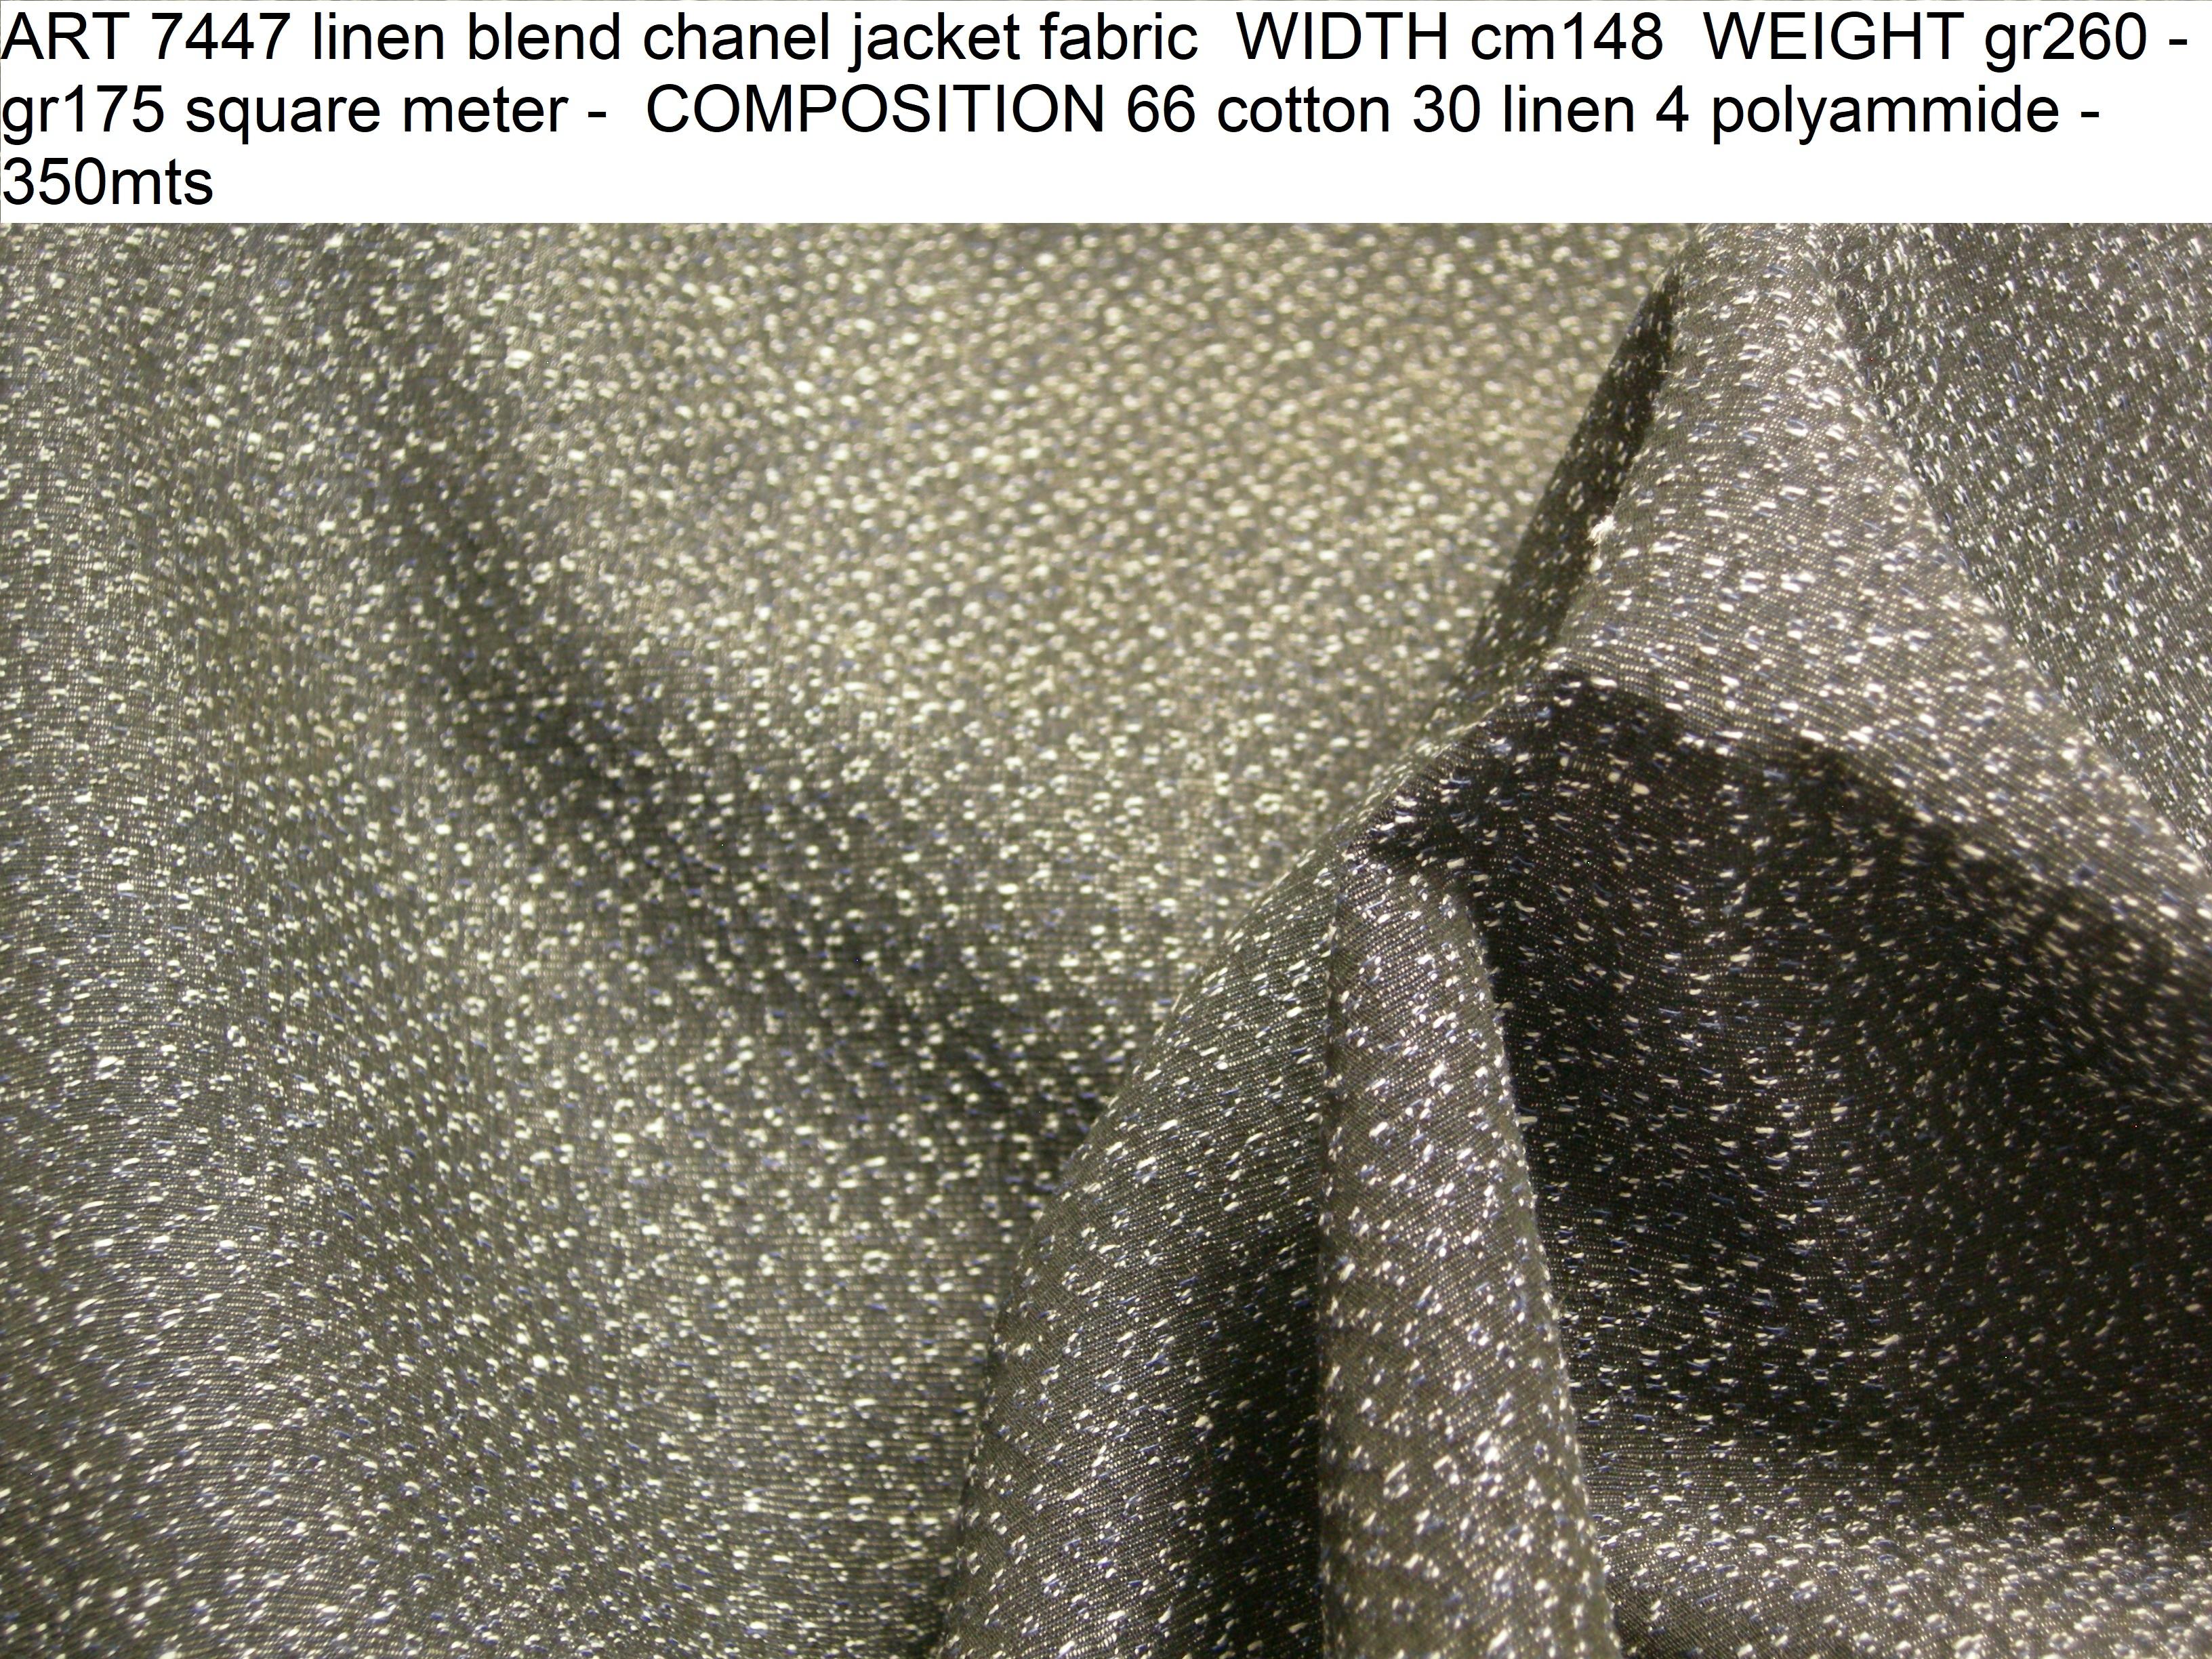 ART 7447 linen blend chanel jacket fabric WIDTH cm148 WEIGHT gr260 - gr175 square meter - COMPOSITION 66 cotton 30 linen 4 polyammide - 350mts